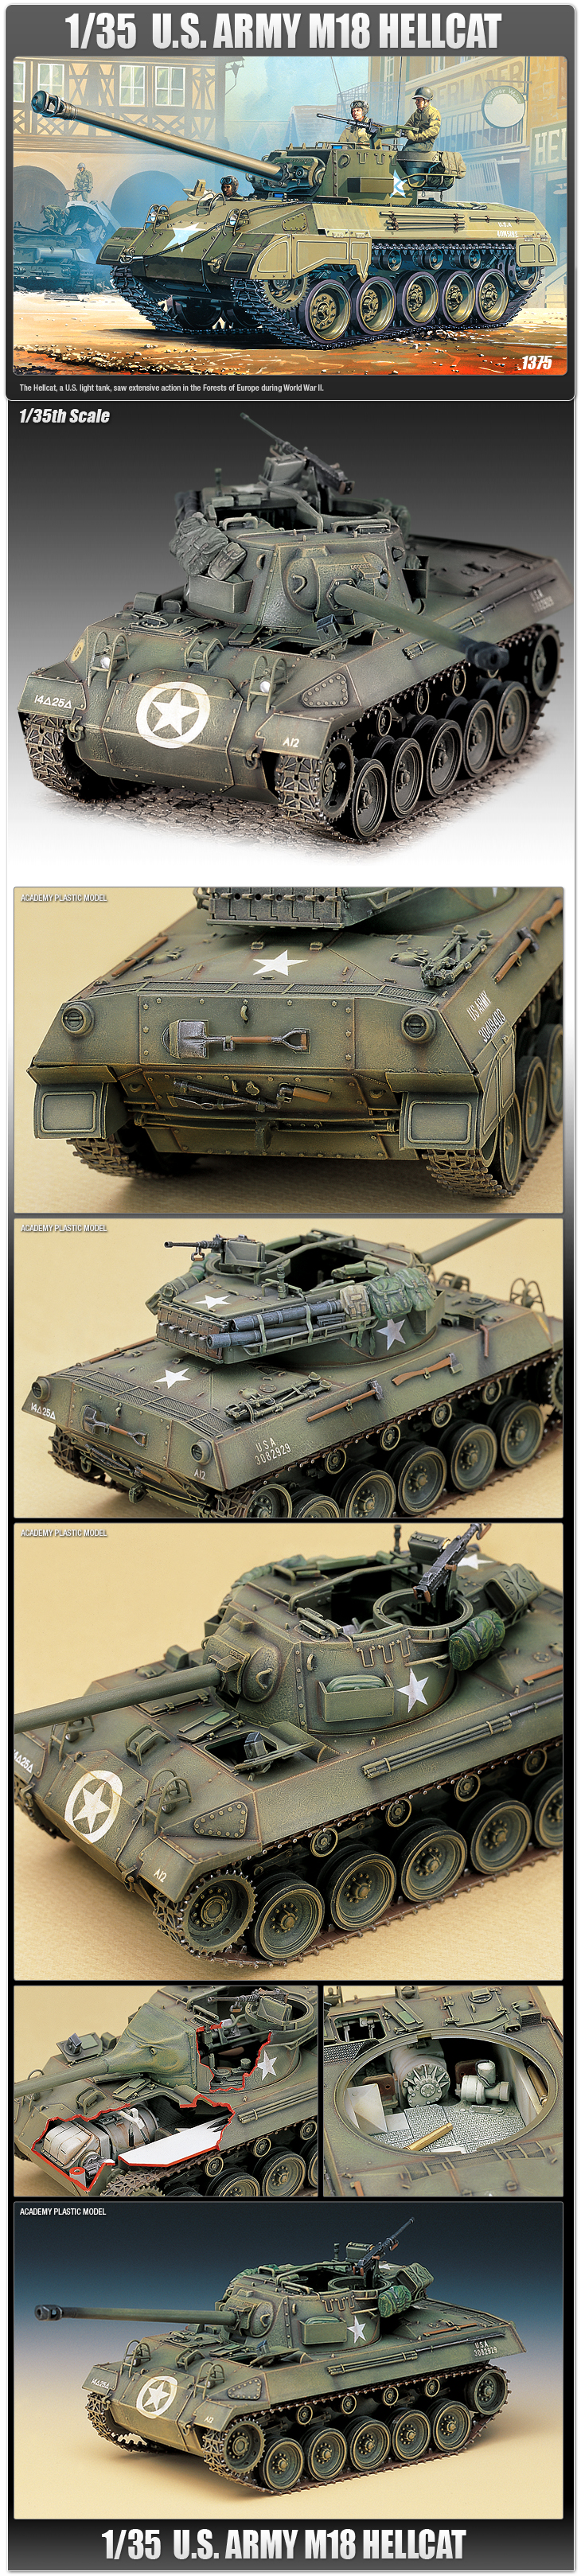 ARMY M18 HELLCAT Light Tank Plastic Model Kit 13255 Academy 1//35 U.S